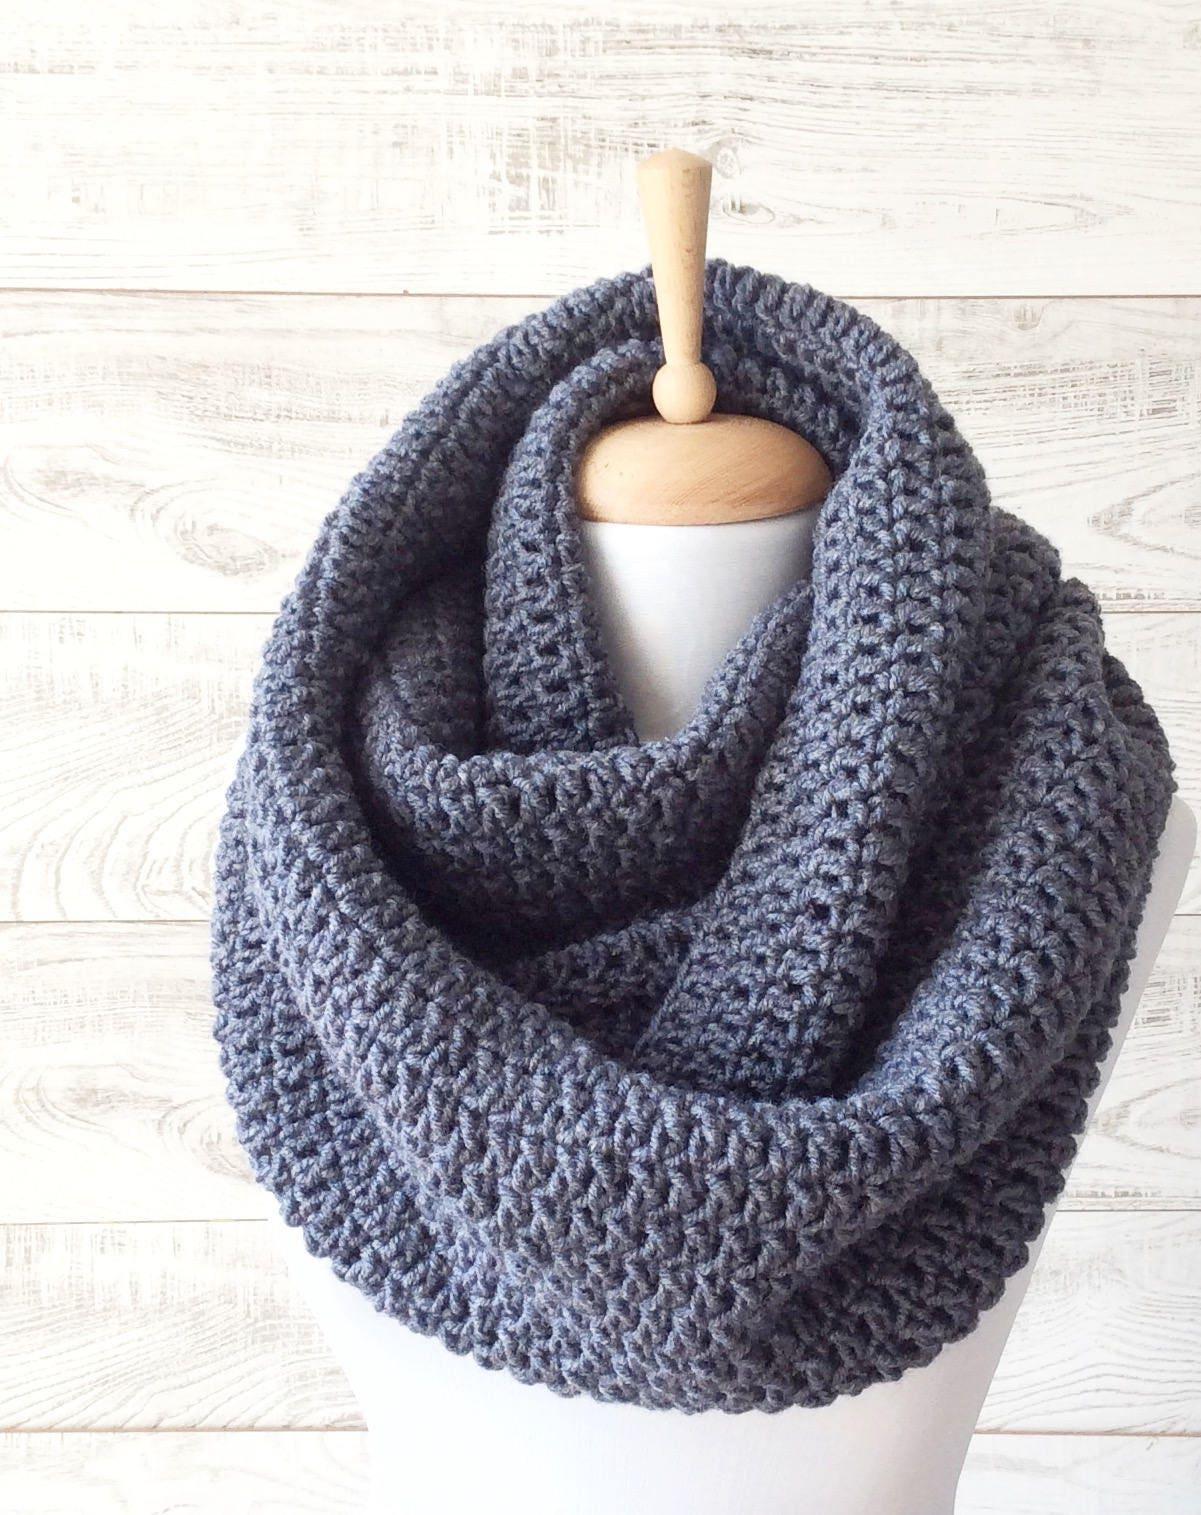 grosse laine charpe en tricot charpe grise pour homme etsy. Black Bedroom Furniture Sets. Home Design Ideas